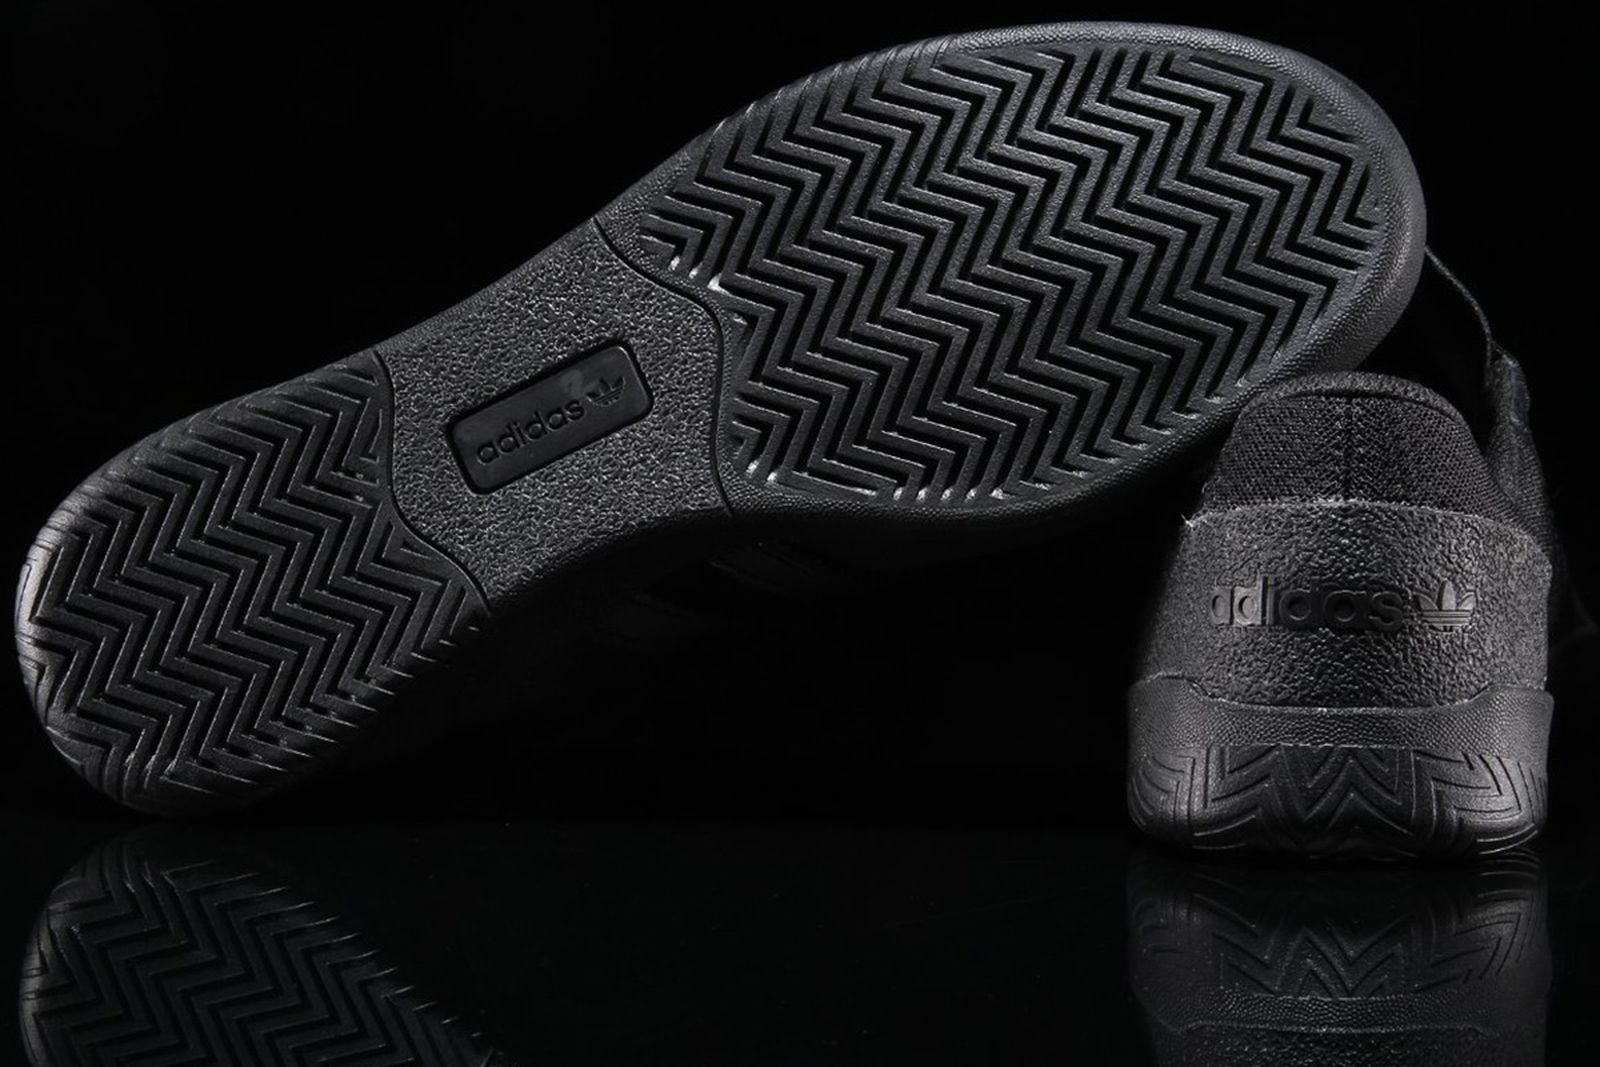 adidas skateboarding city cup busenitz release date price adidas Busenitz adidas City Cup